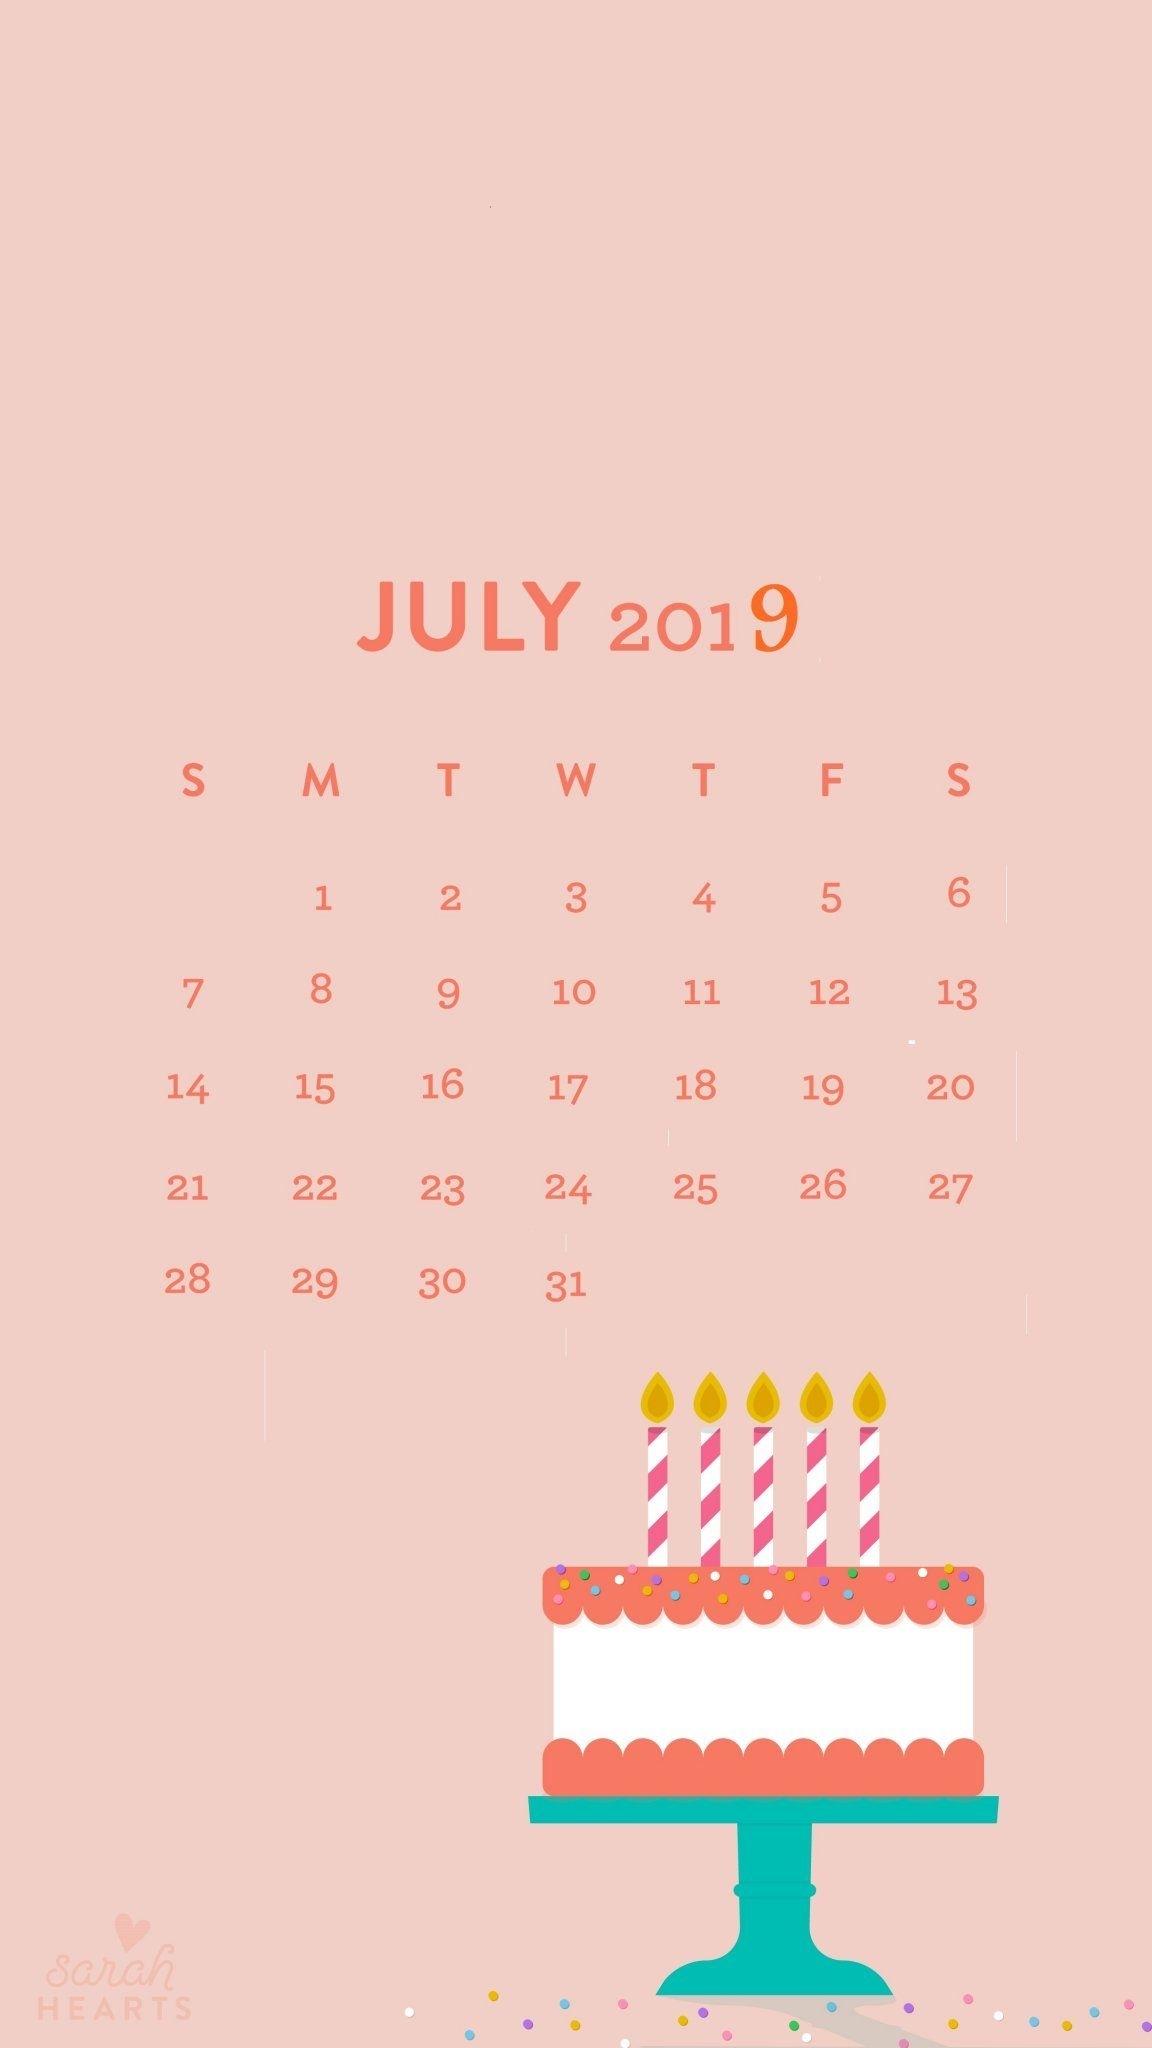 July 2019 Iphone Calendar Wallpaper #july #july2019Calendar